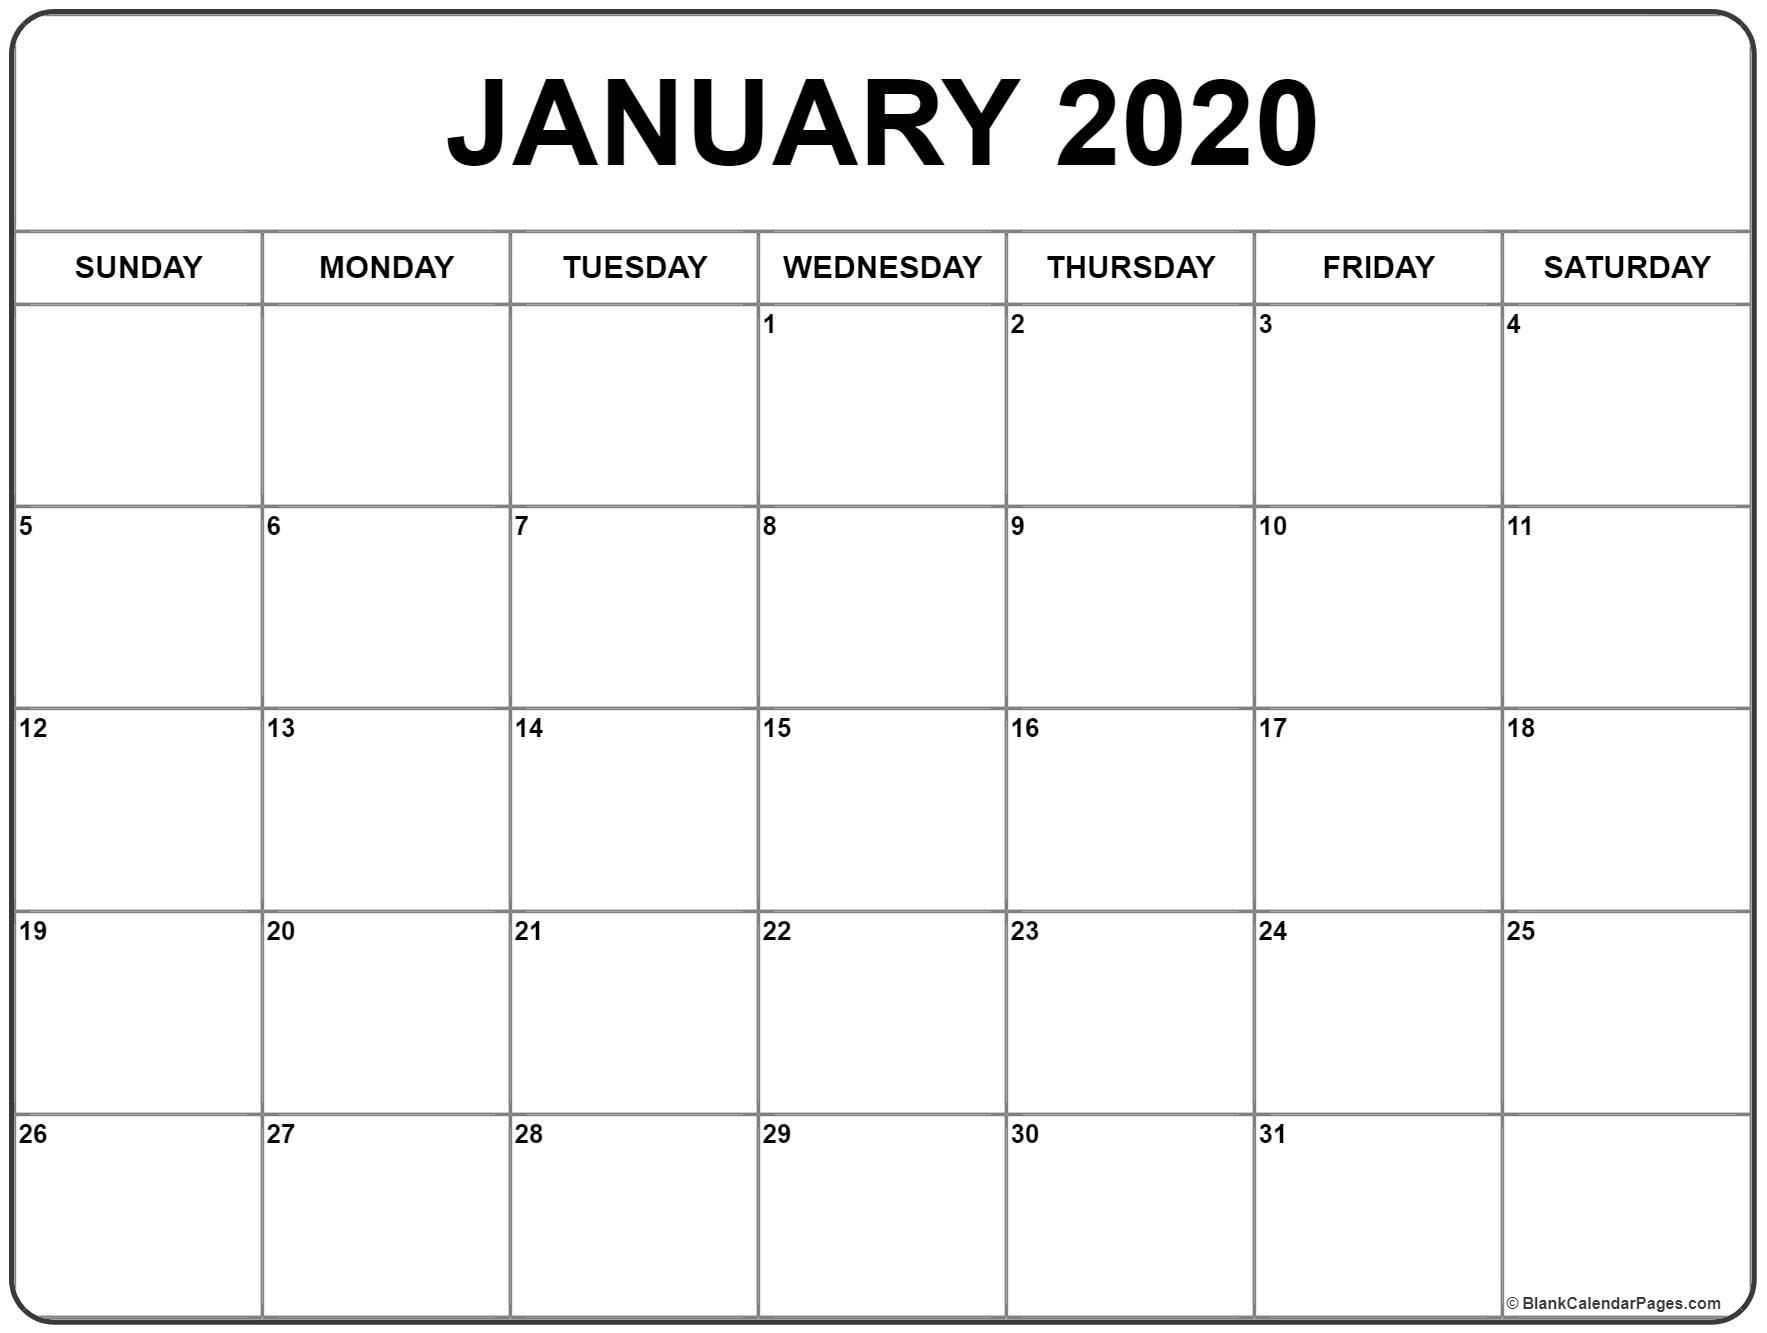 January 2020 Calendar | Free Printable Monthly Calendars-January 2020 Calendar Marriage Dates